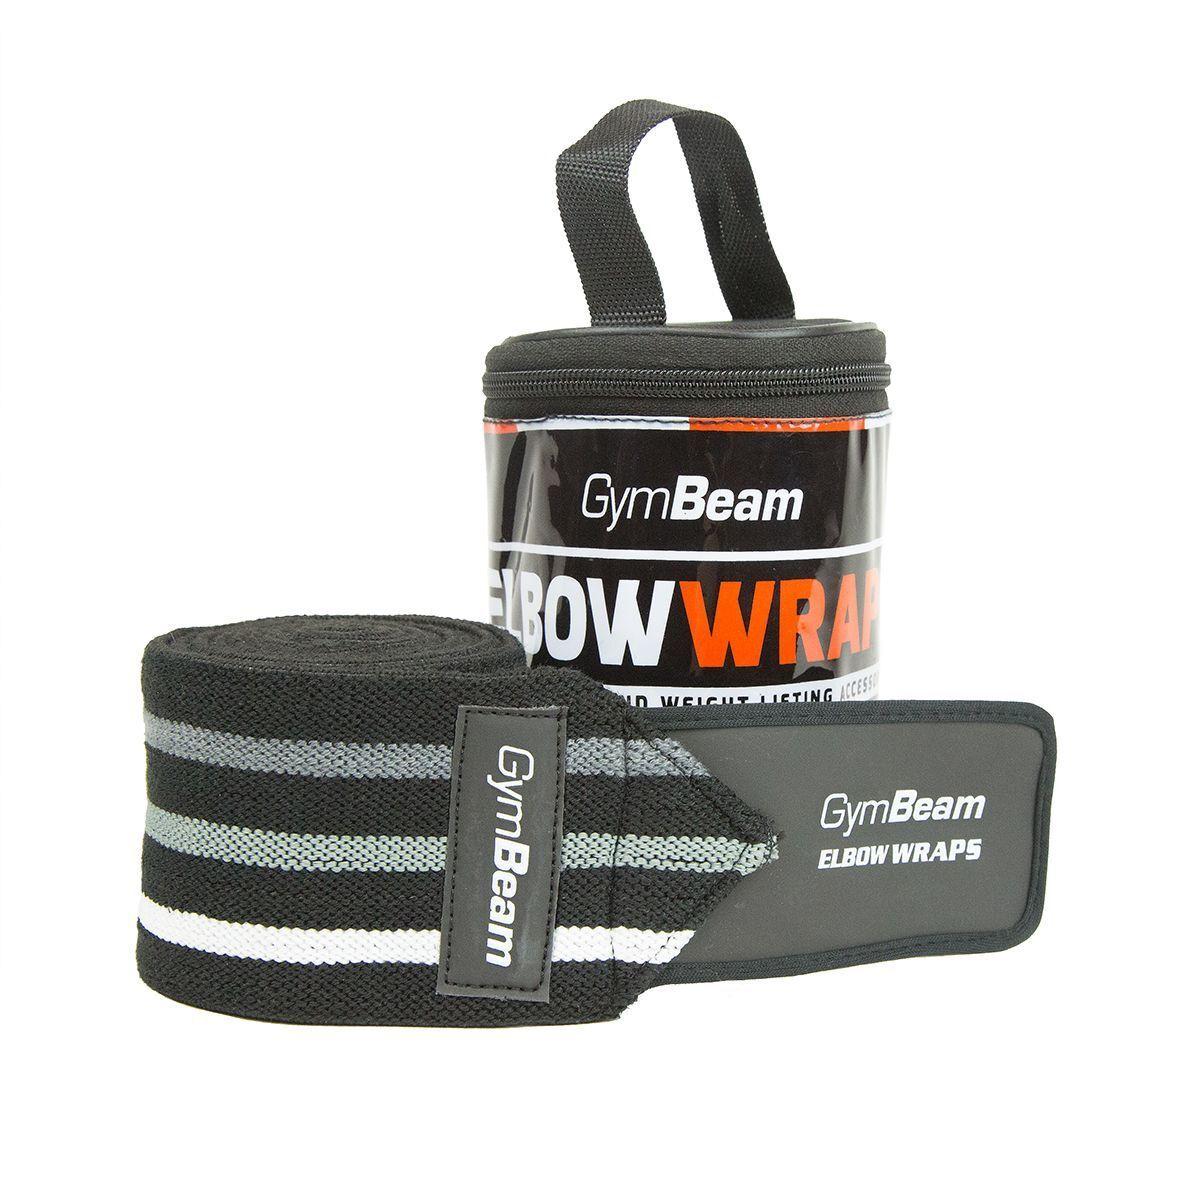 Fitness Gym Beam Elbow Wraps